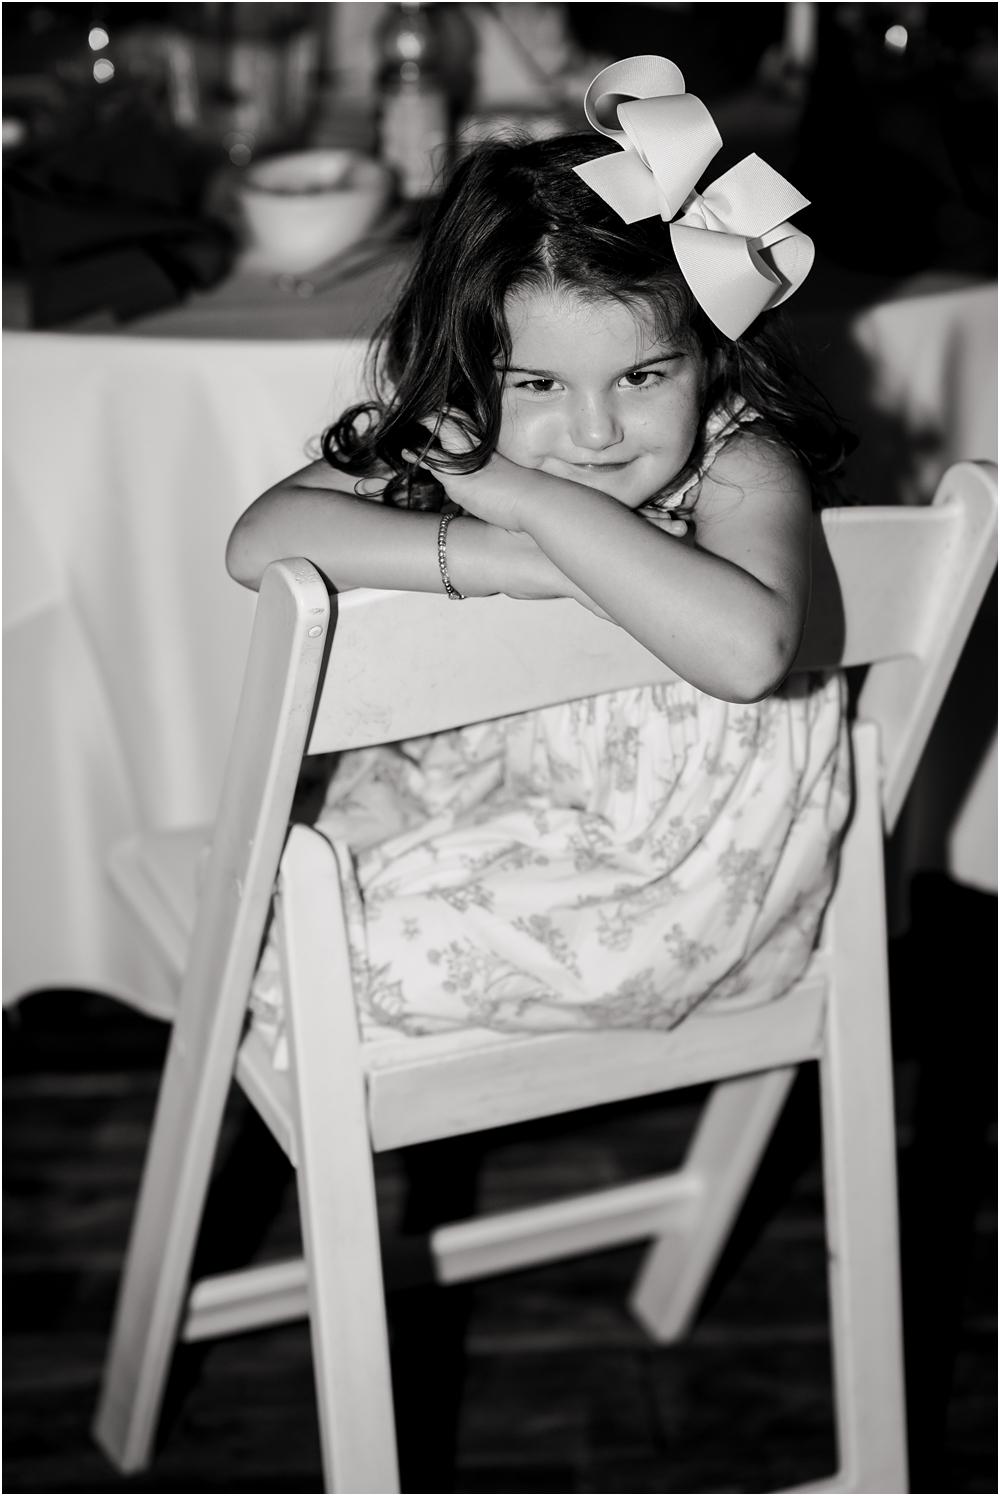 ledman-wedding-kiersten-stevenson-photography-30a-panama-city-beach-dothan-tallahassee-(665-of-763).JPG